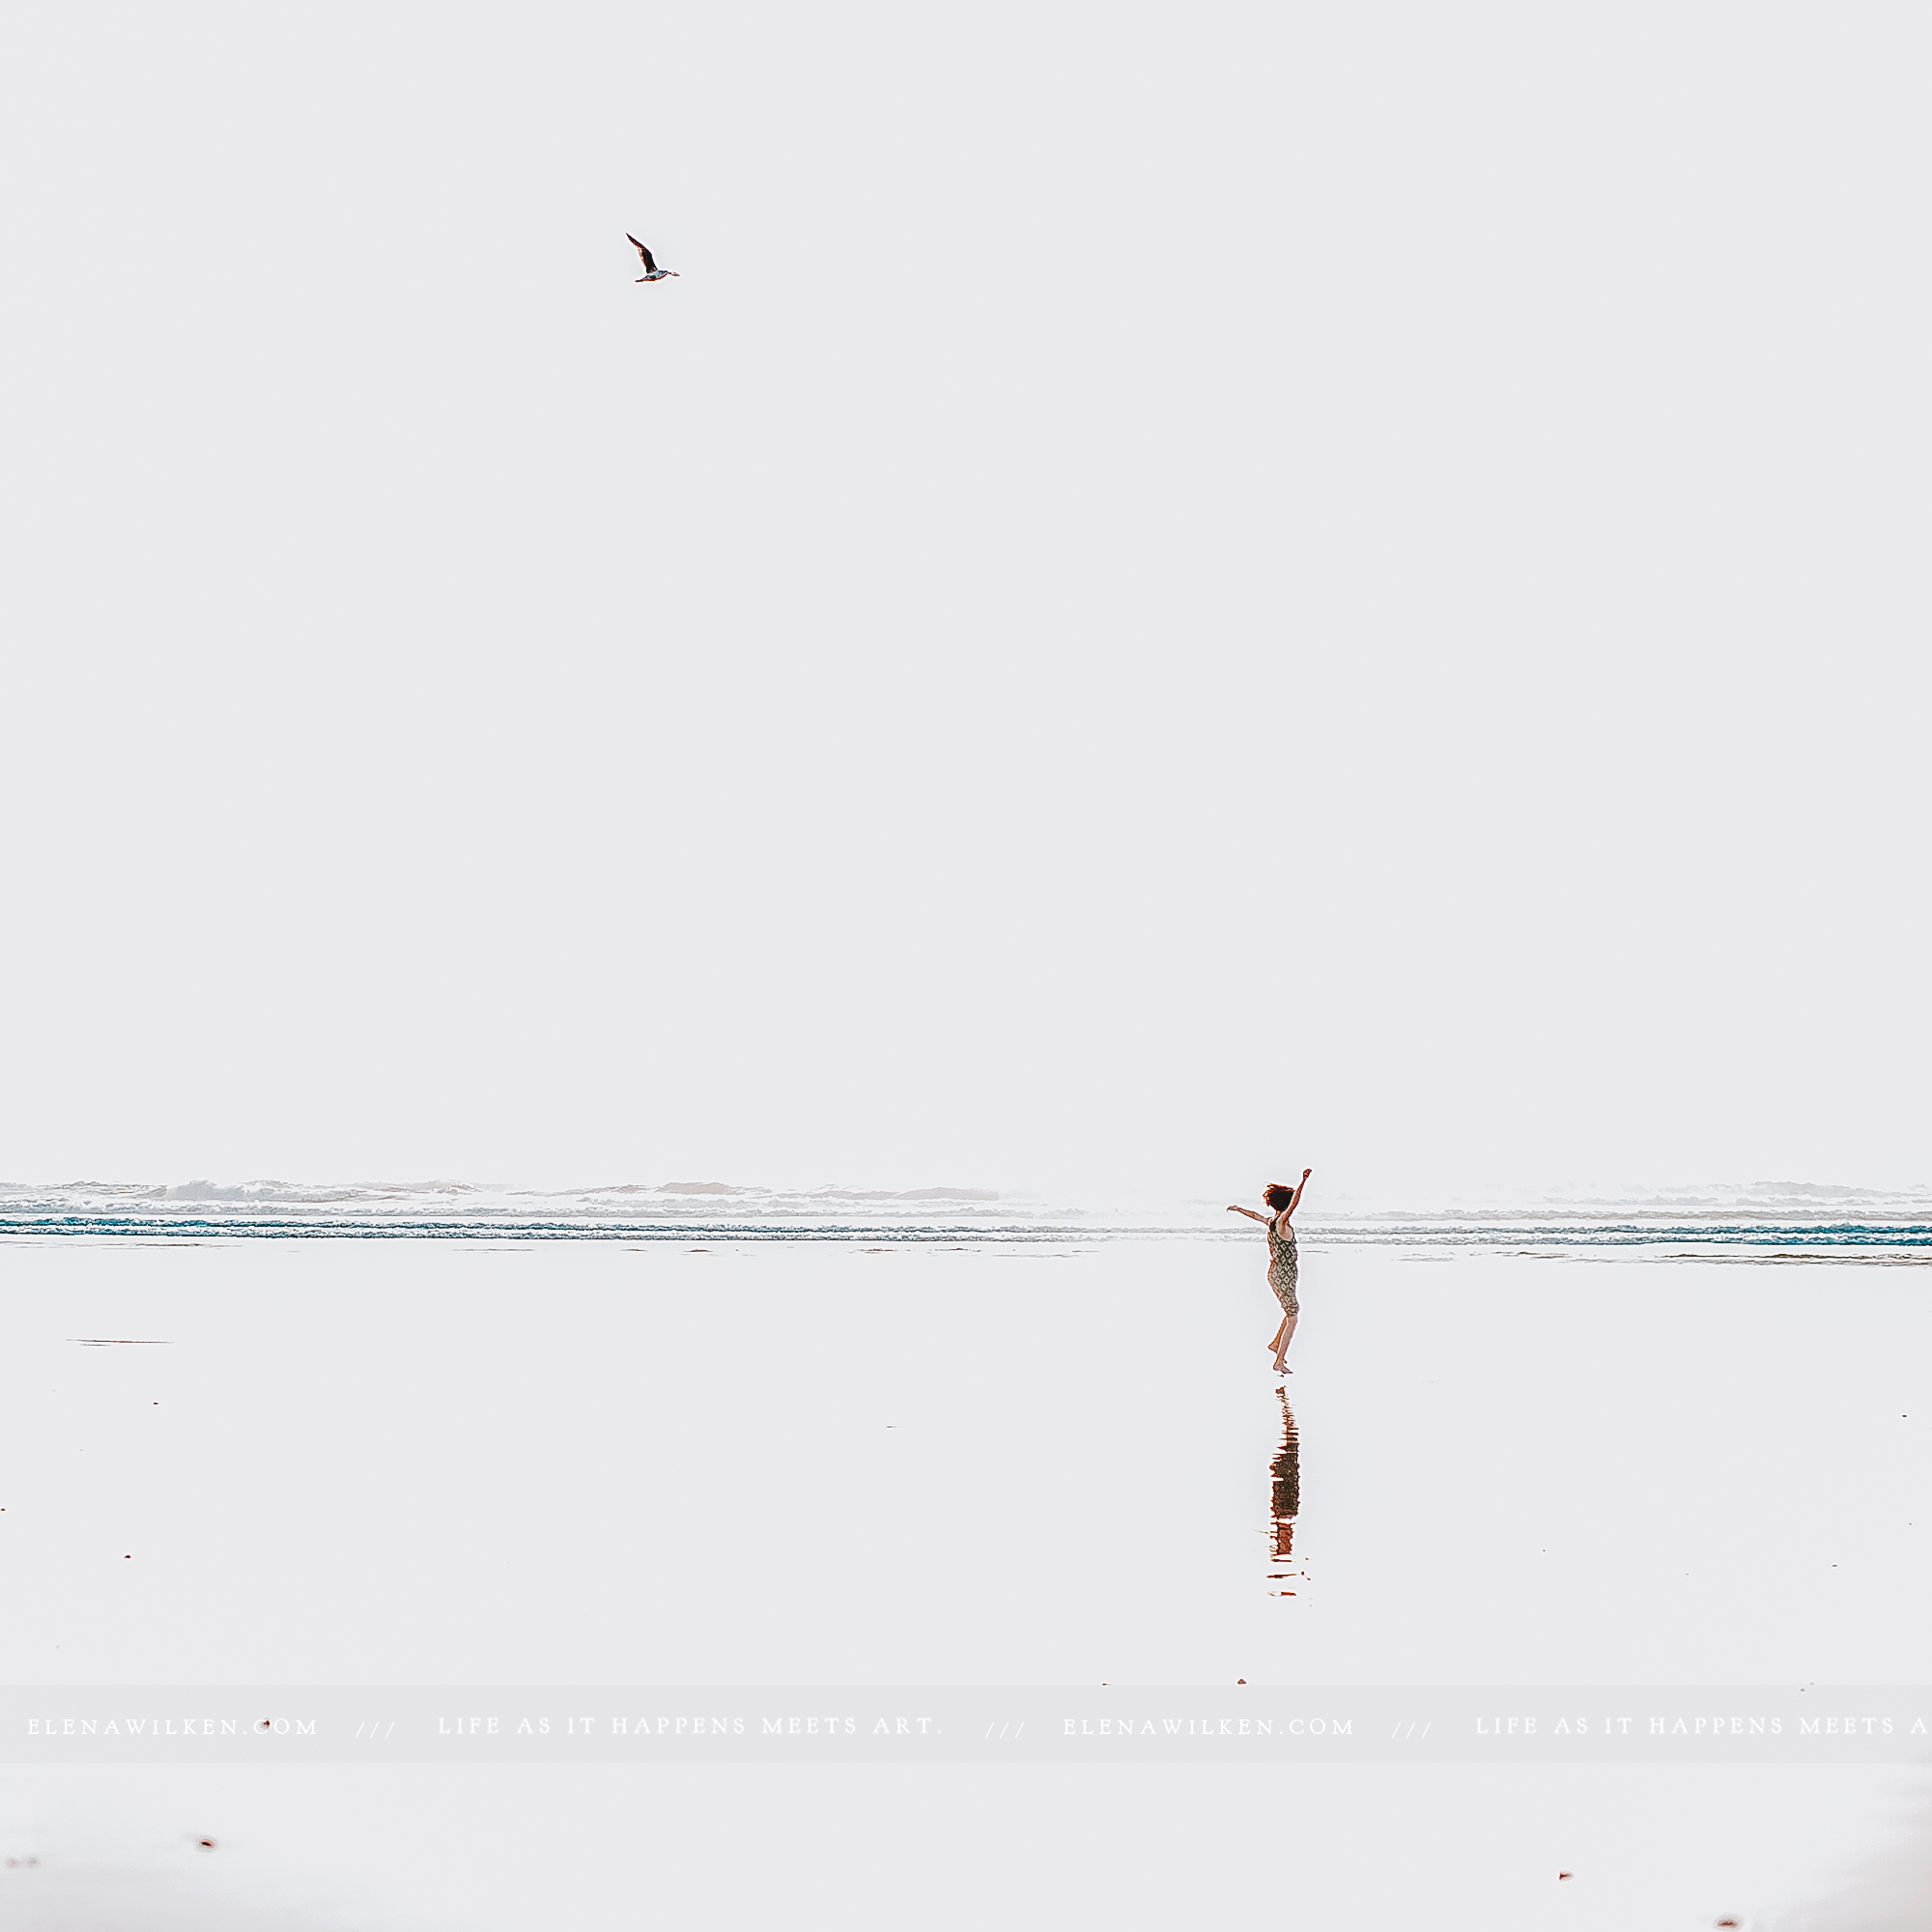 dancing-on-the-beach-cannon-beach-elena-wilken.jpg